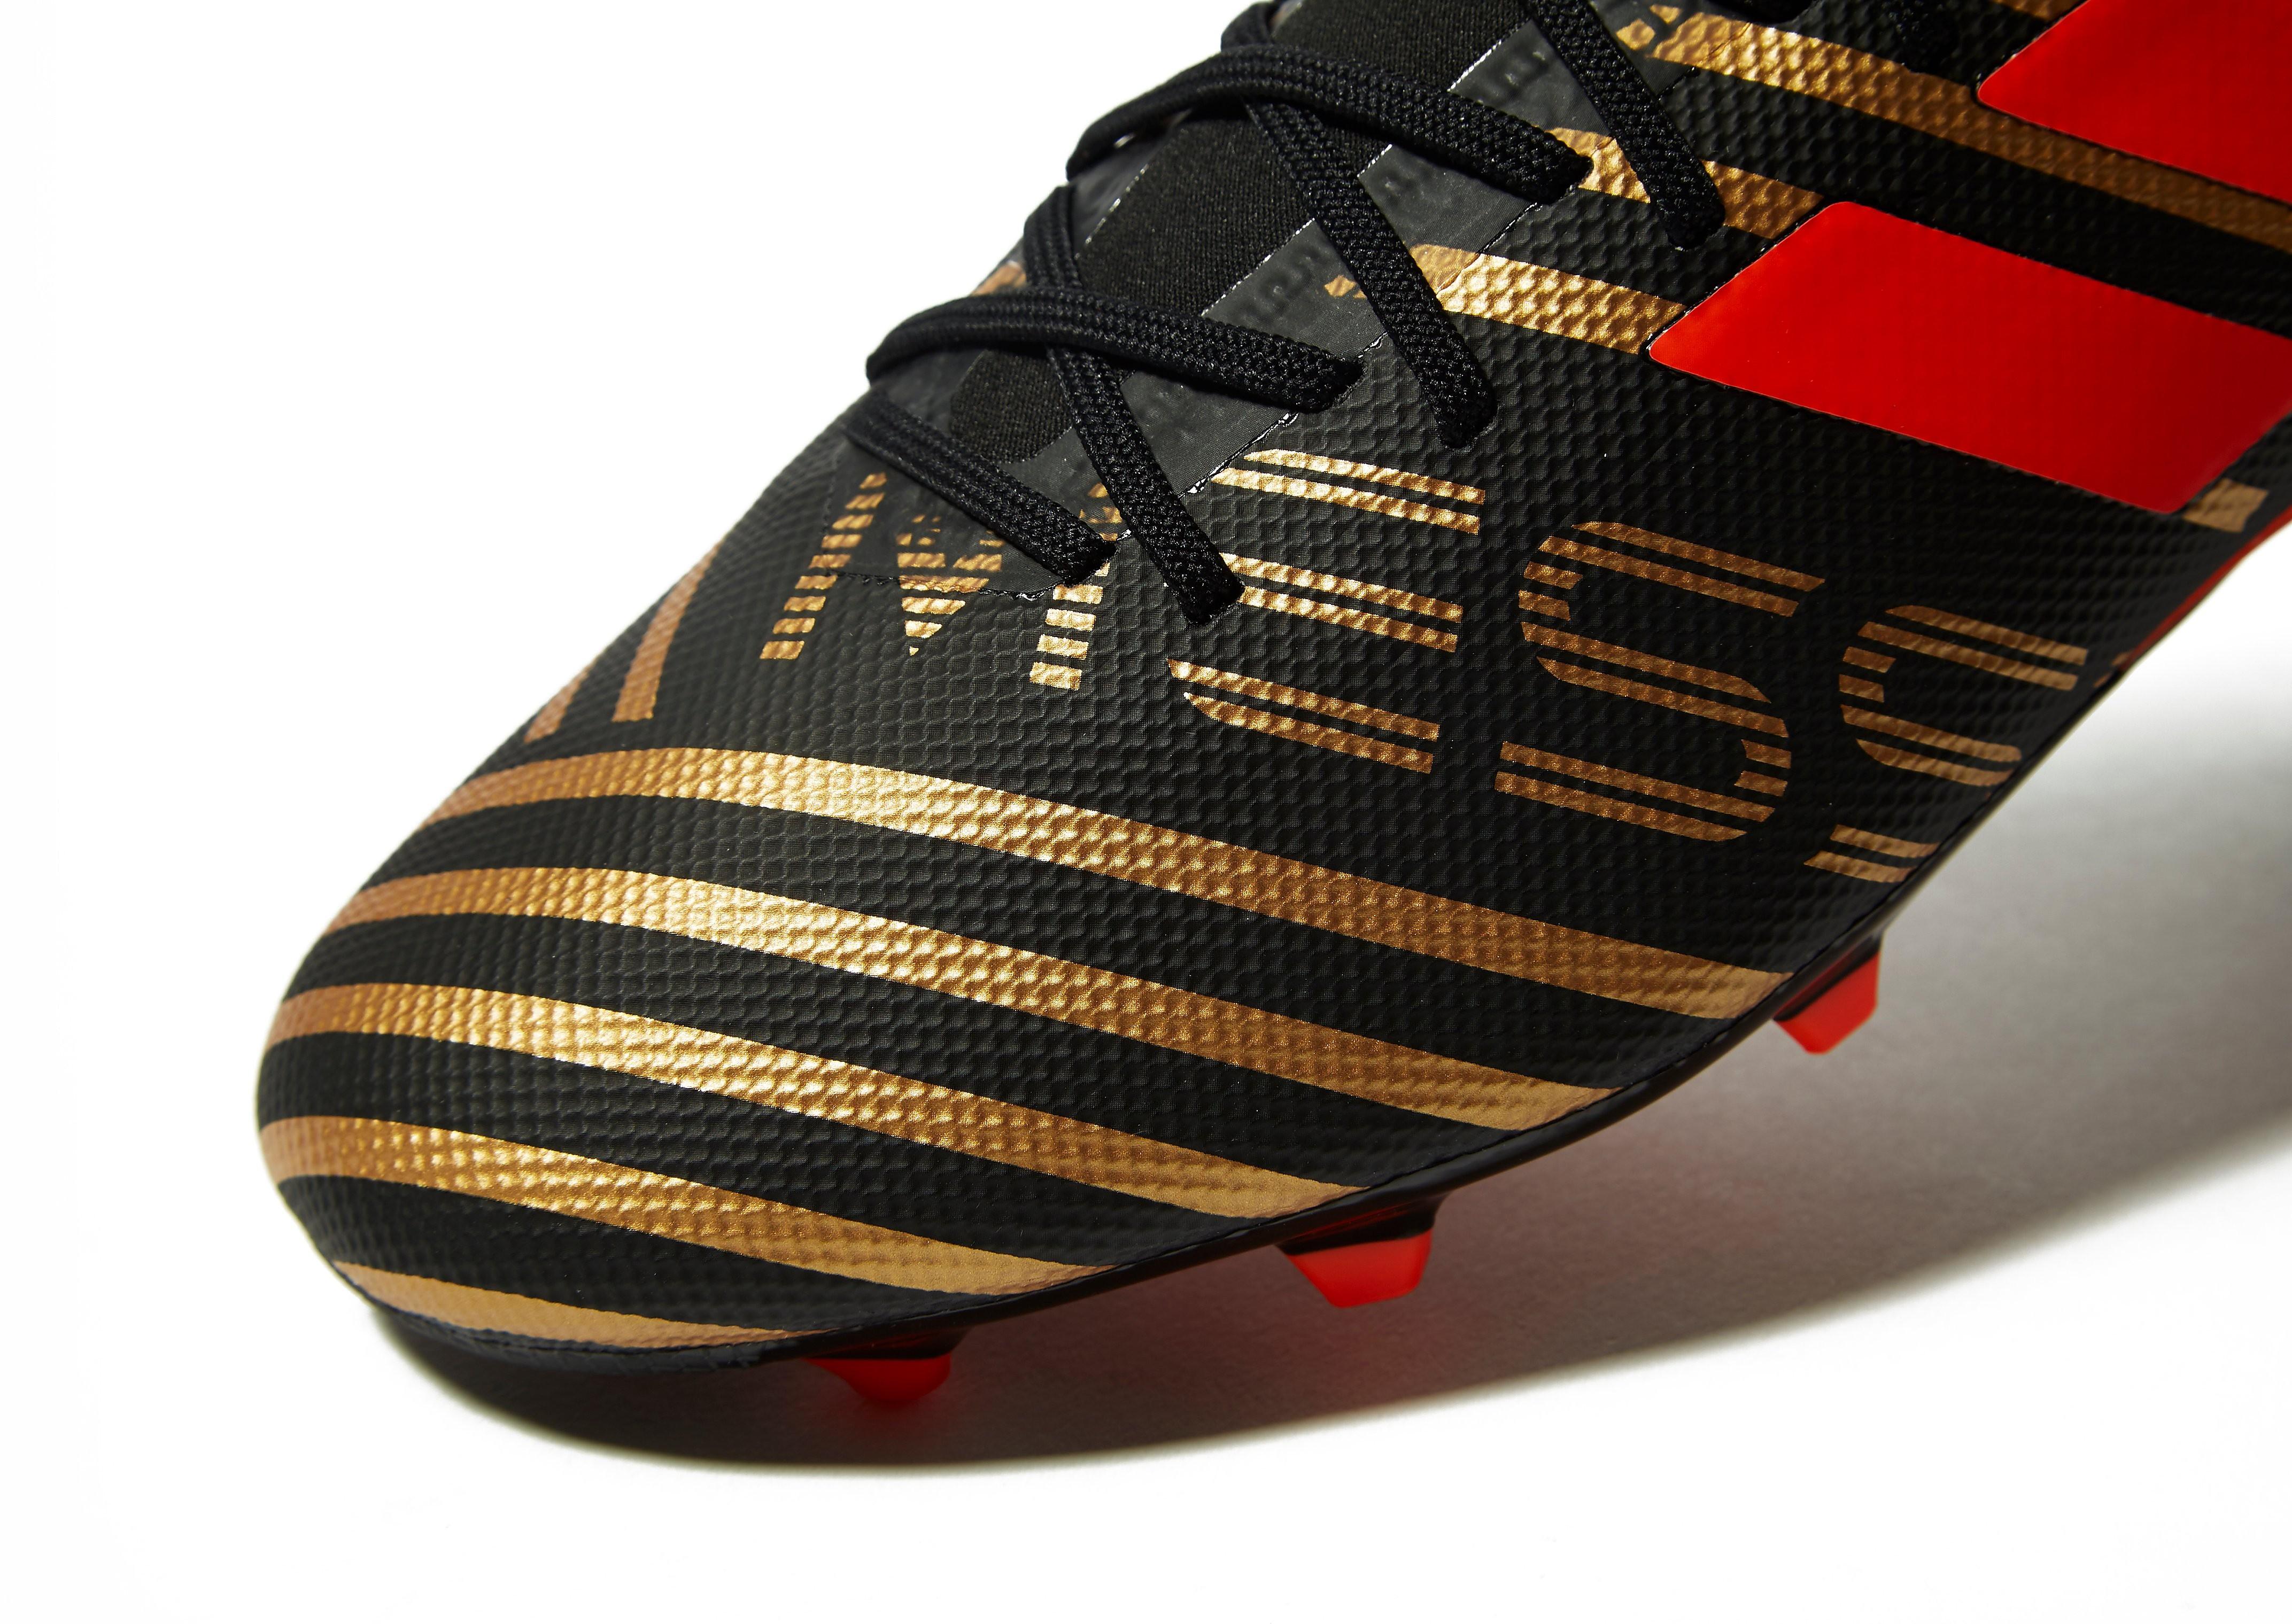 adidas SkyStalker Nemeziz Messi 17.3 FG